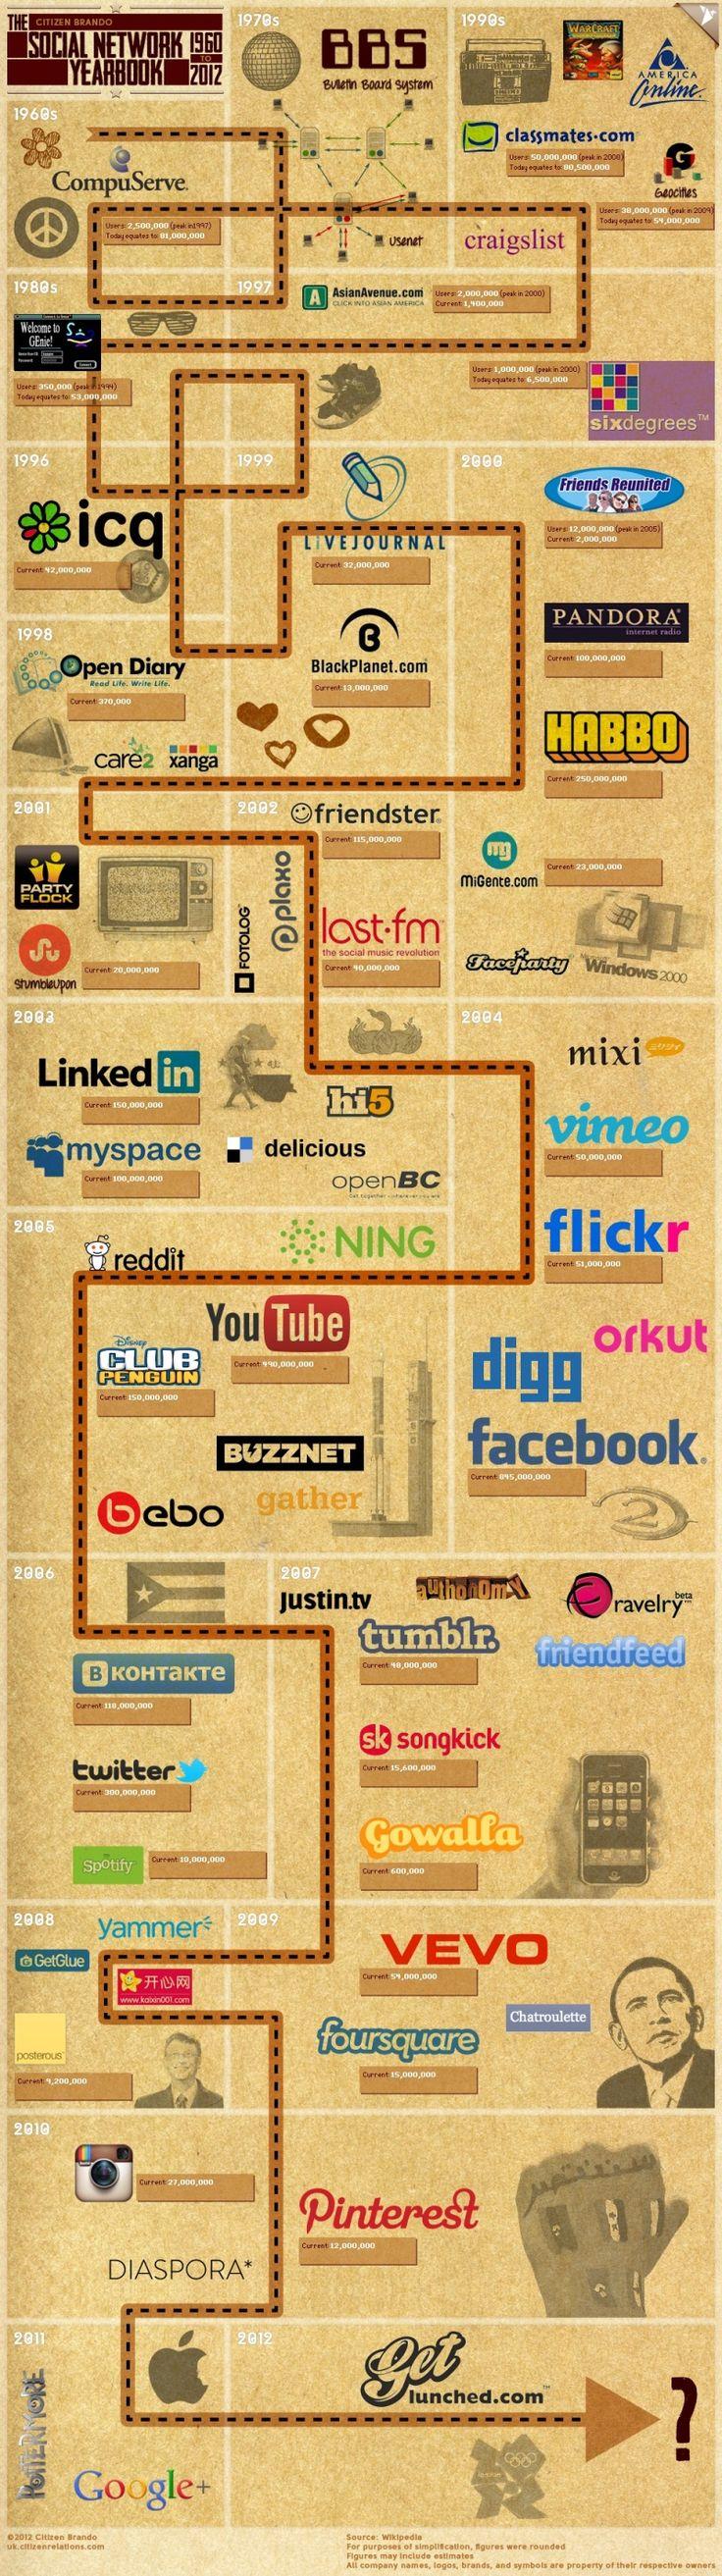 Social Media Timeline - infographic